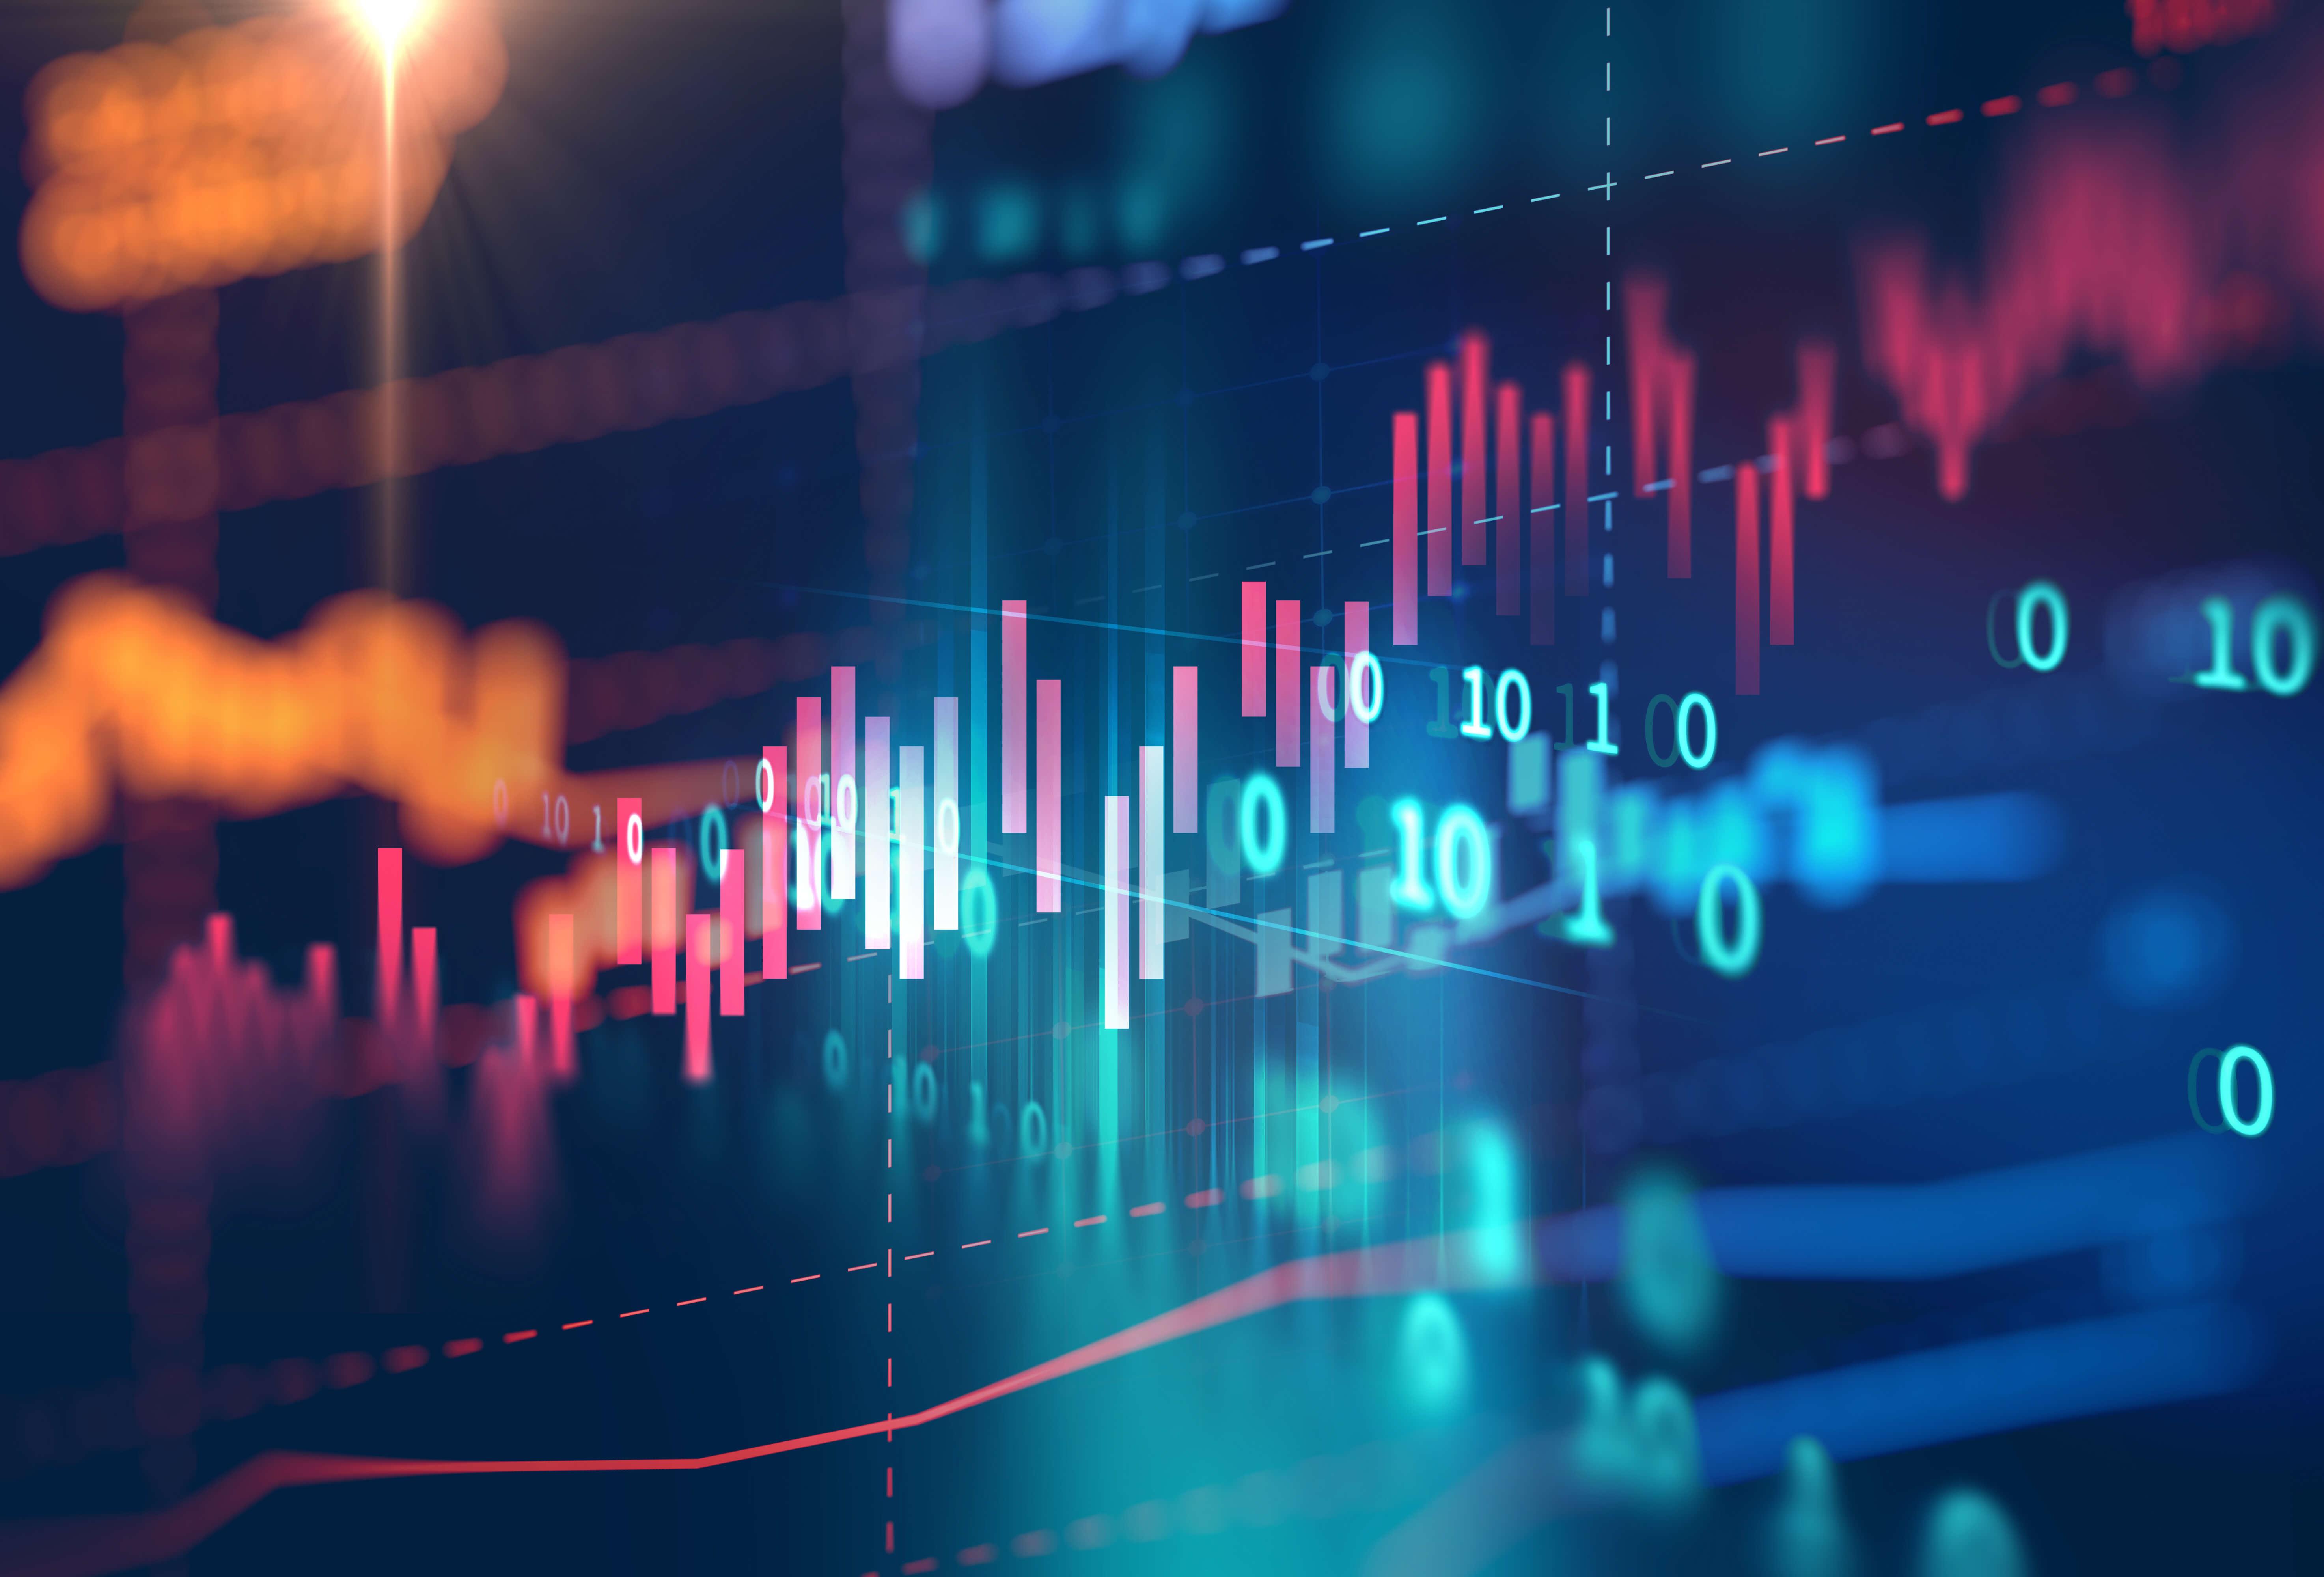 Bitcoin live trading volume